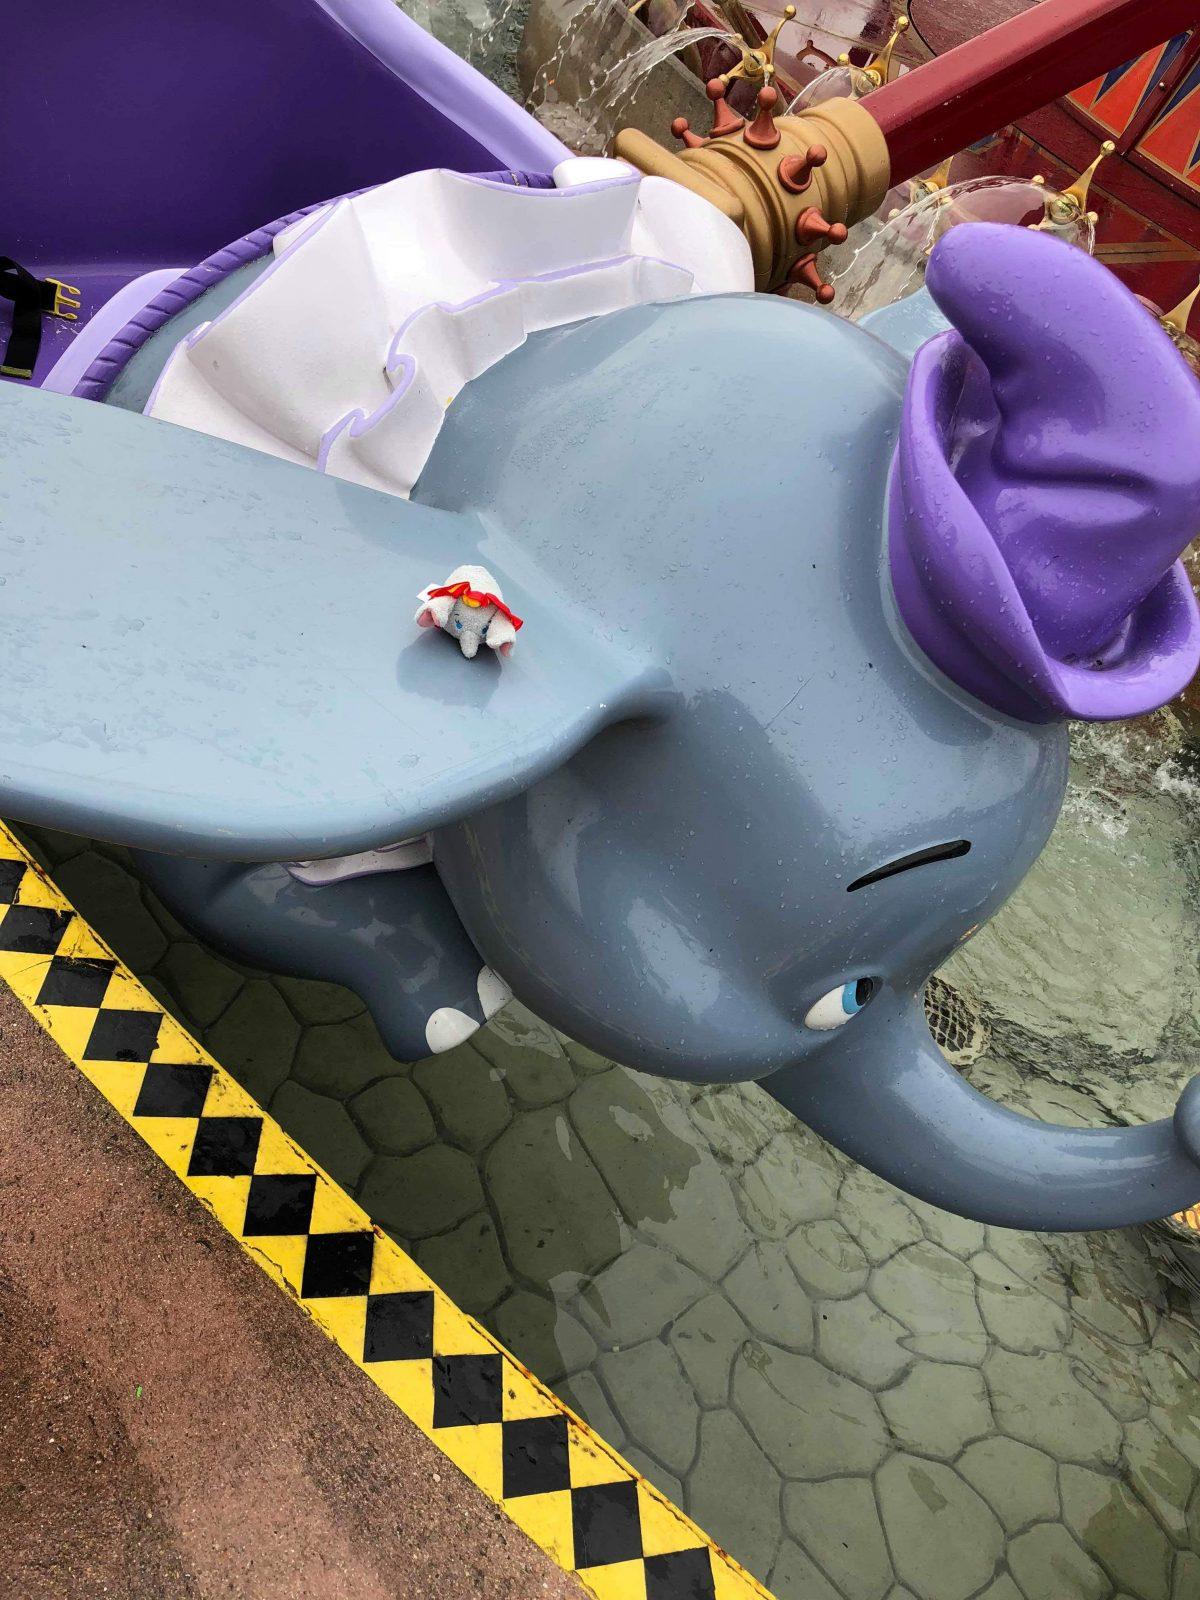 A dumbo cart, part of the Dumbo ride at Disneyland Paris